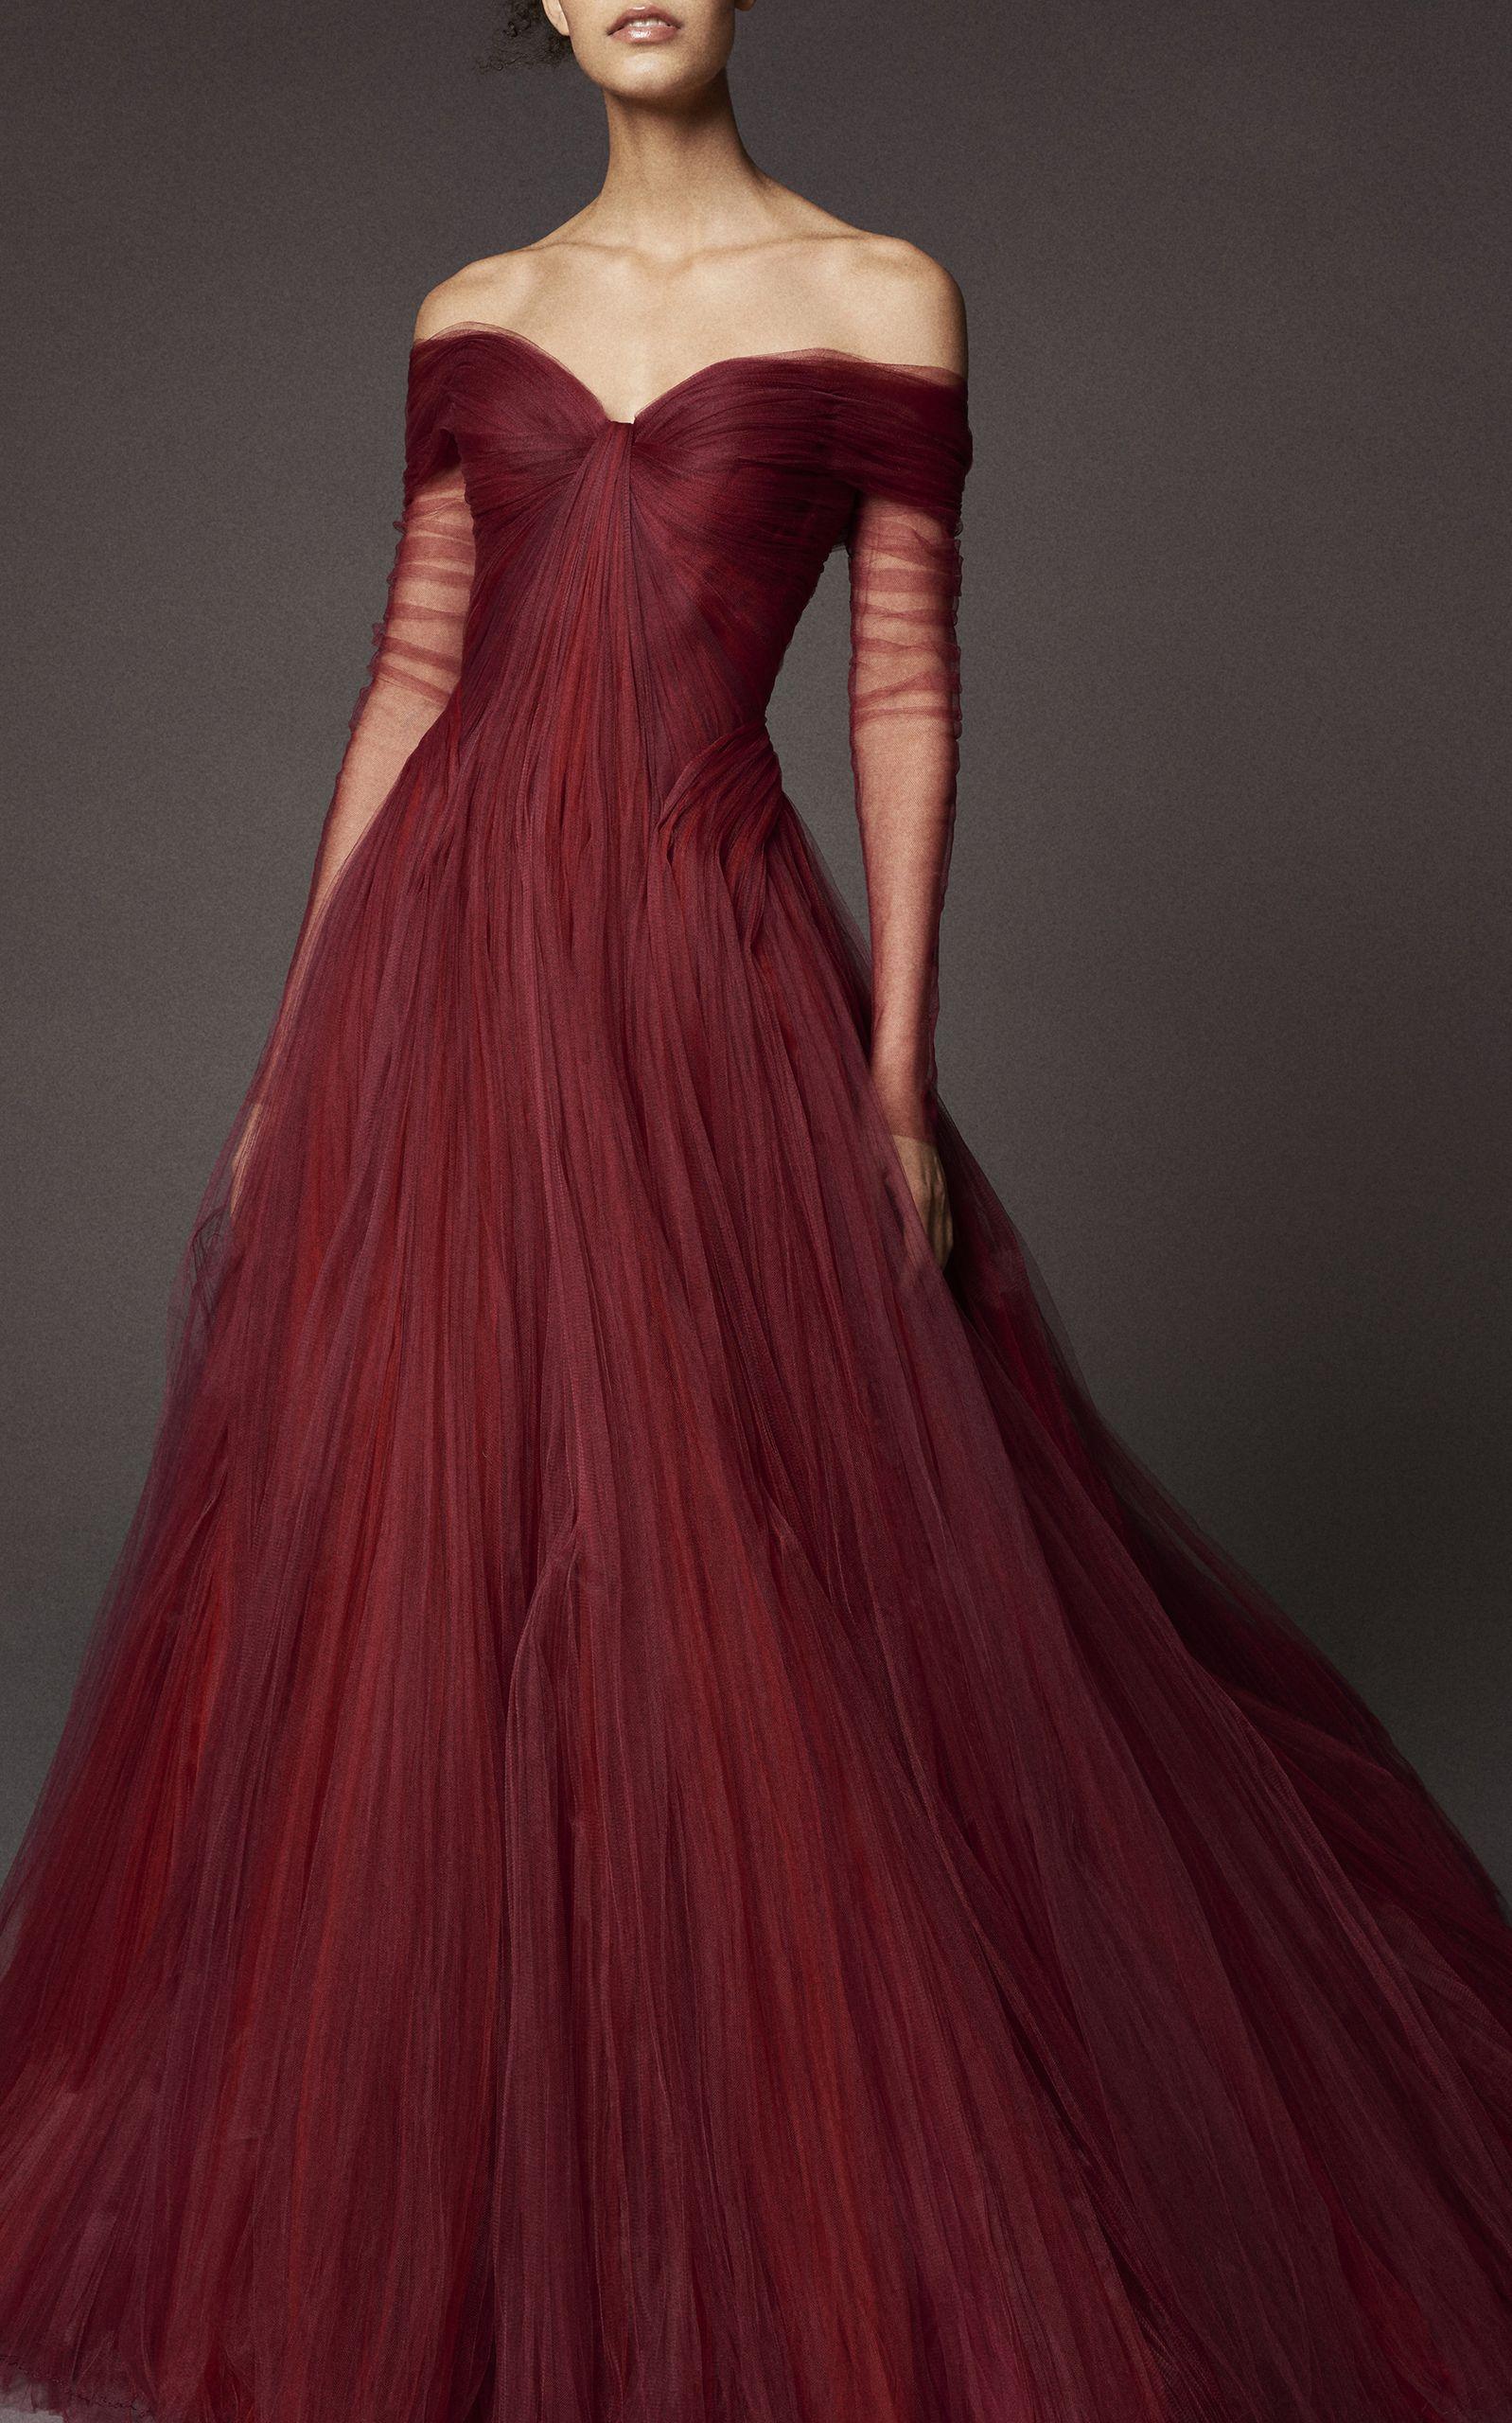 Tulle Ball Gown by ZAC POSEN for Preorder on Moda Operandi | Women\'s ...